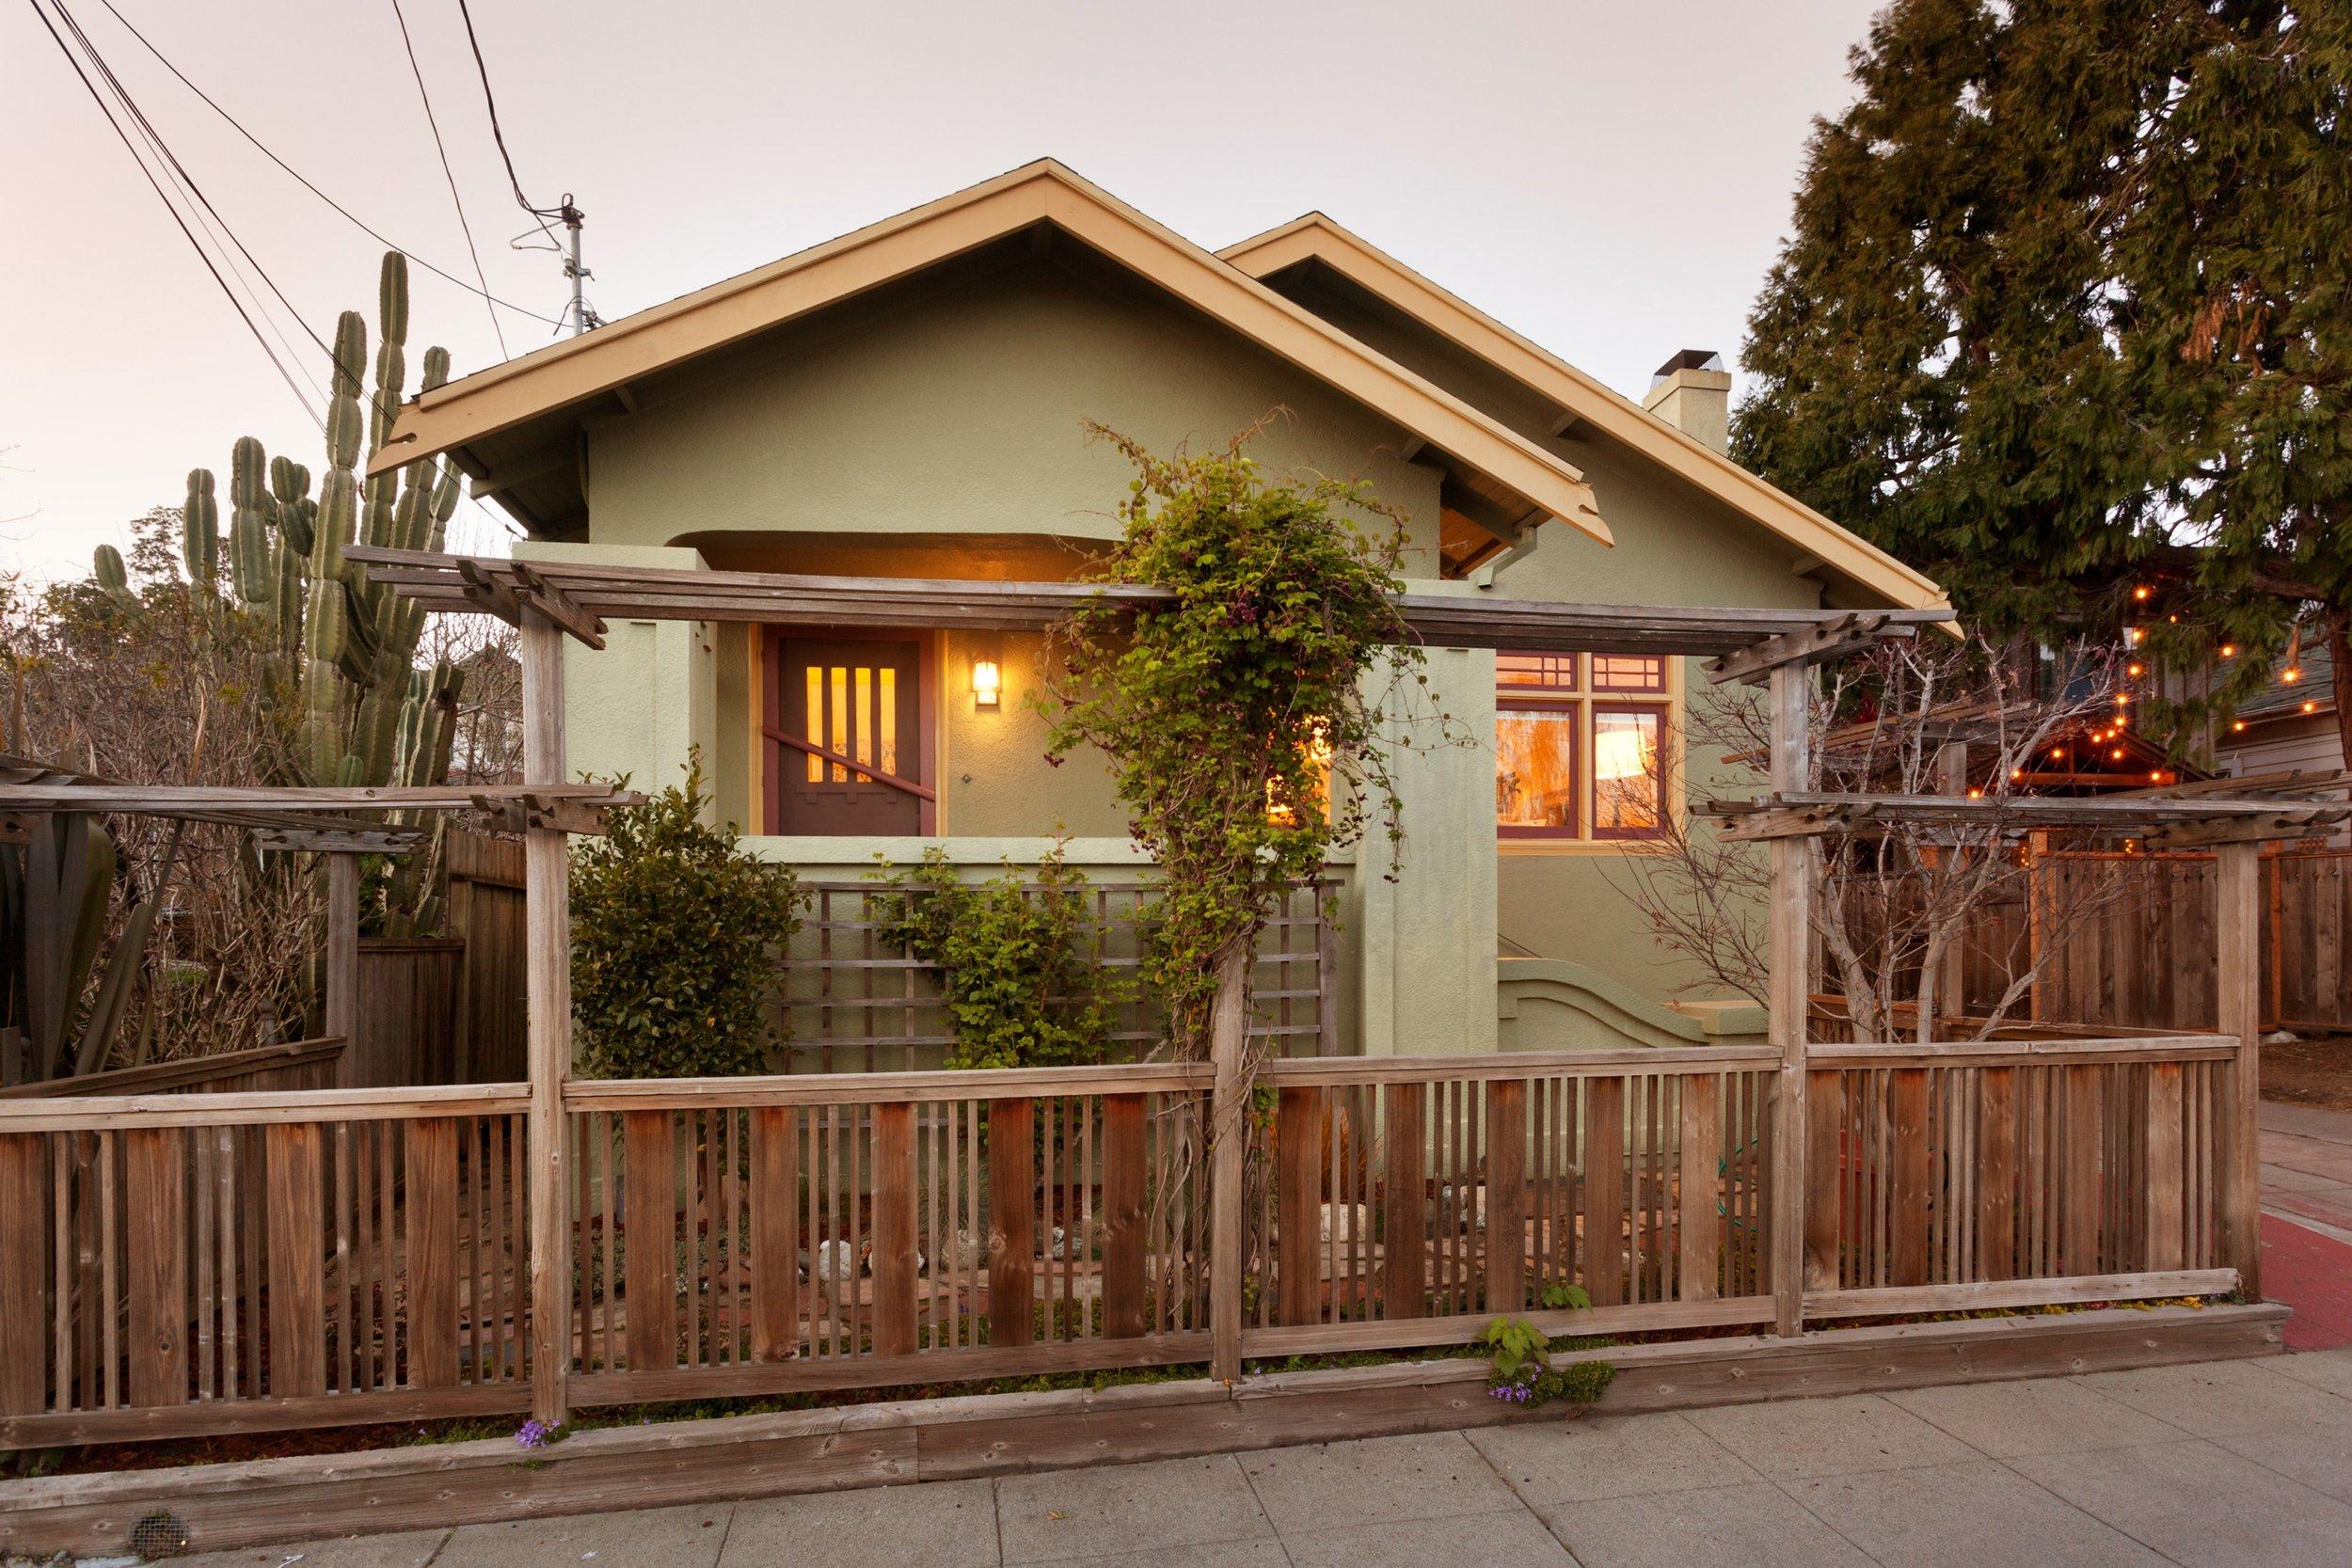 SOLD | 462 43rd Street, Oakland $1,415,000